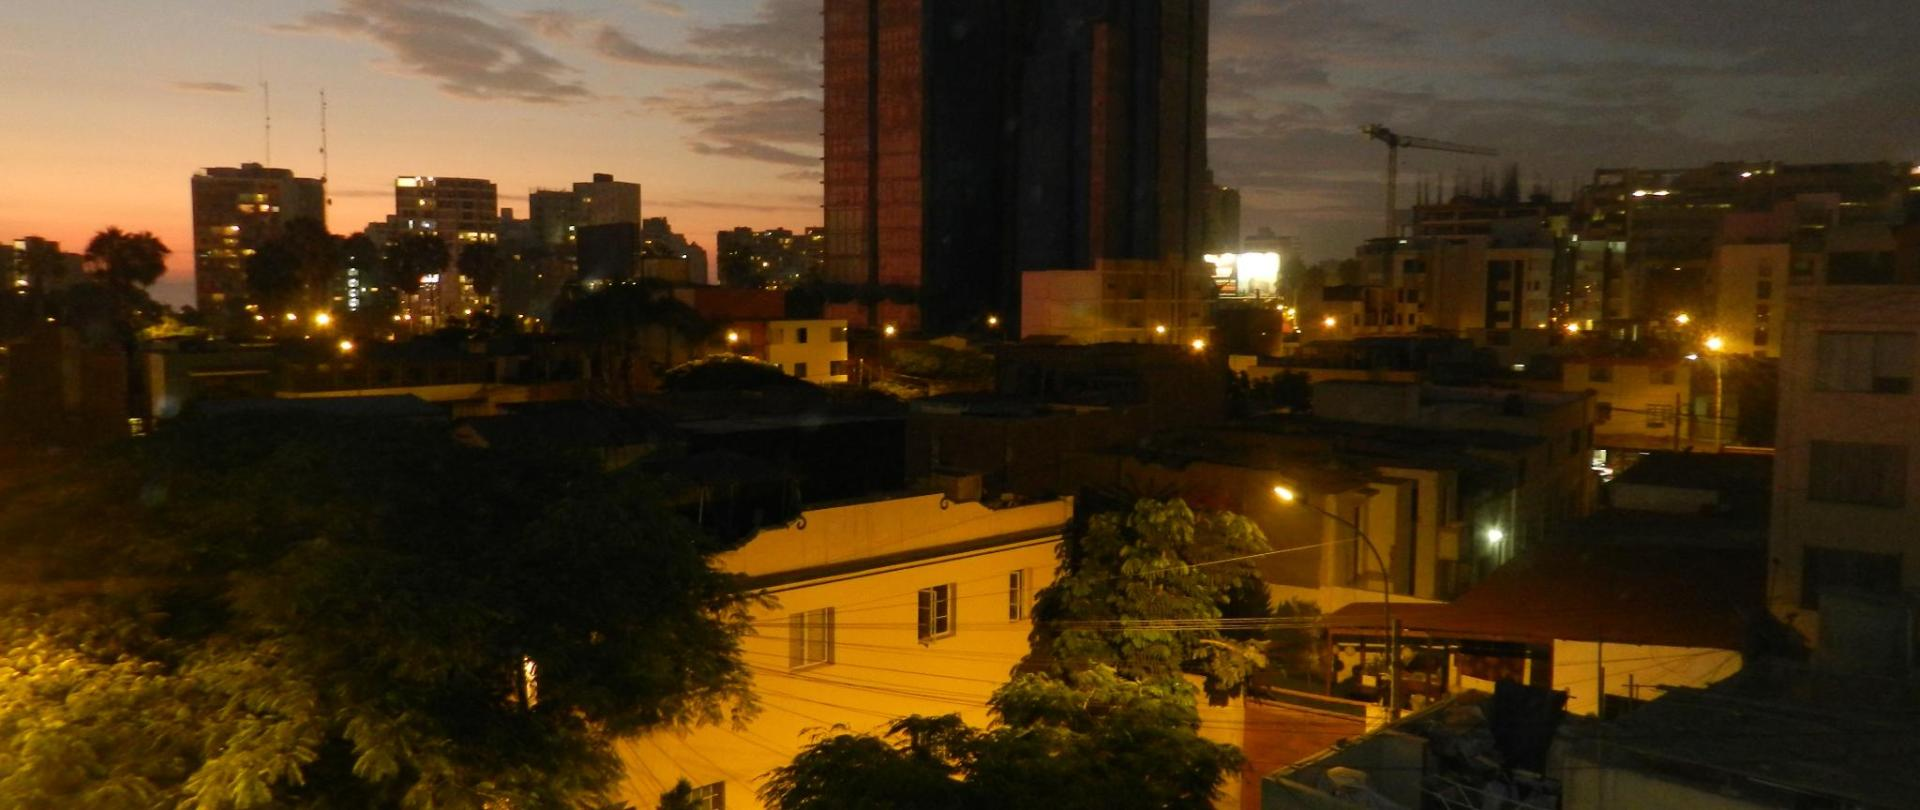 Terraza de Noche.JPG